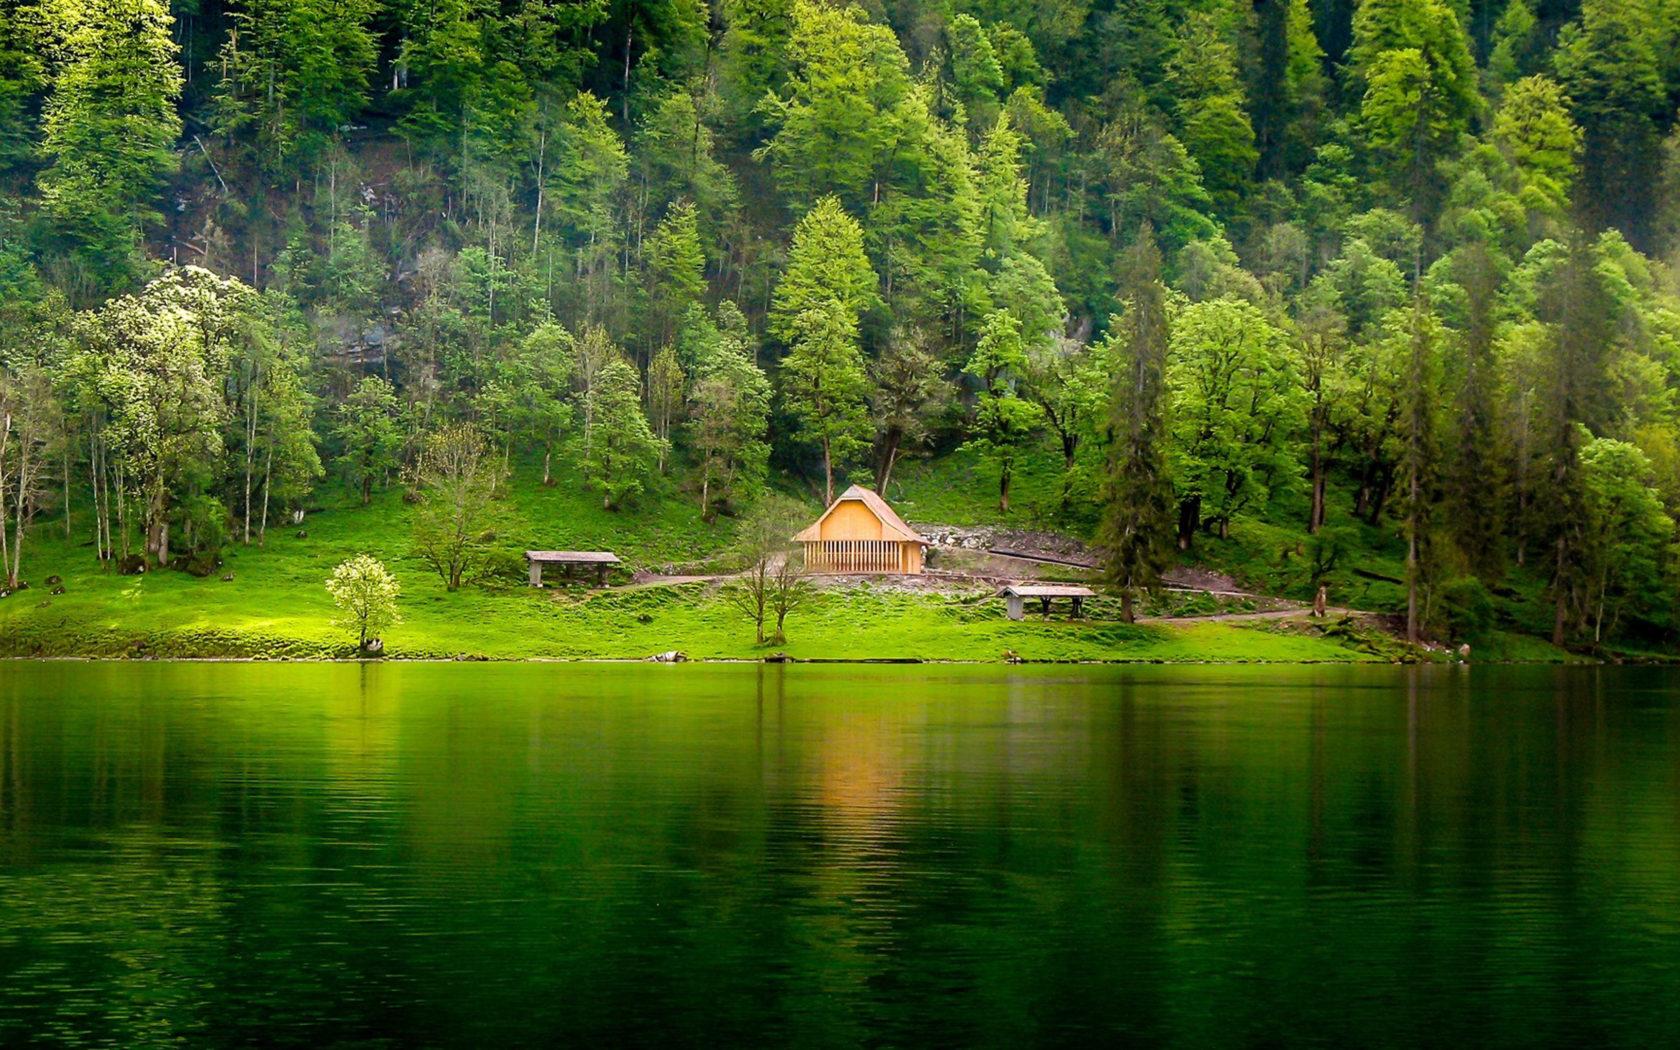 High Resolution Wallpaper Fall Leaves Green Lake Wooden House Pine Forest Meadow Hd Desktop